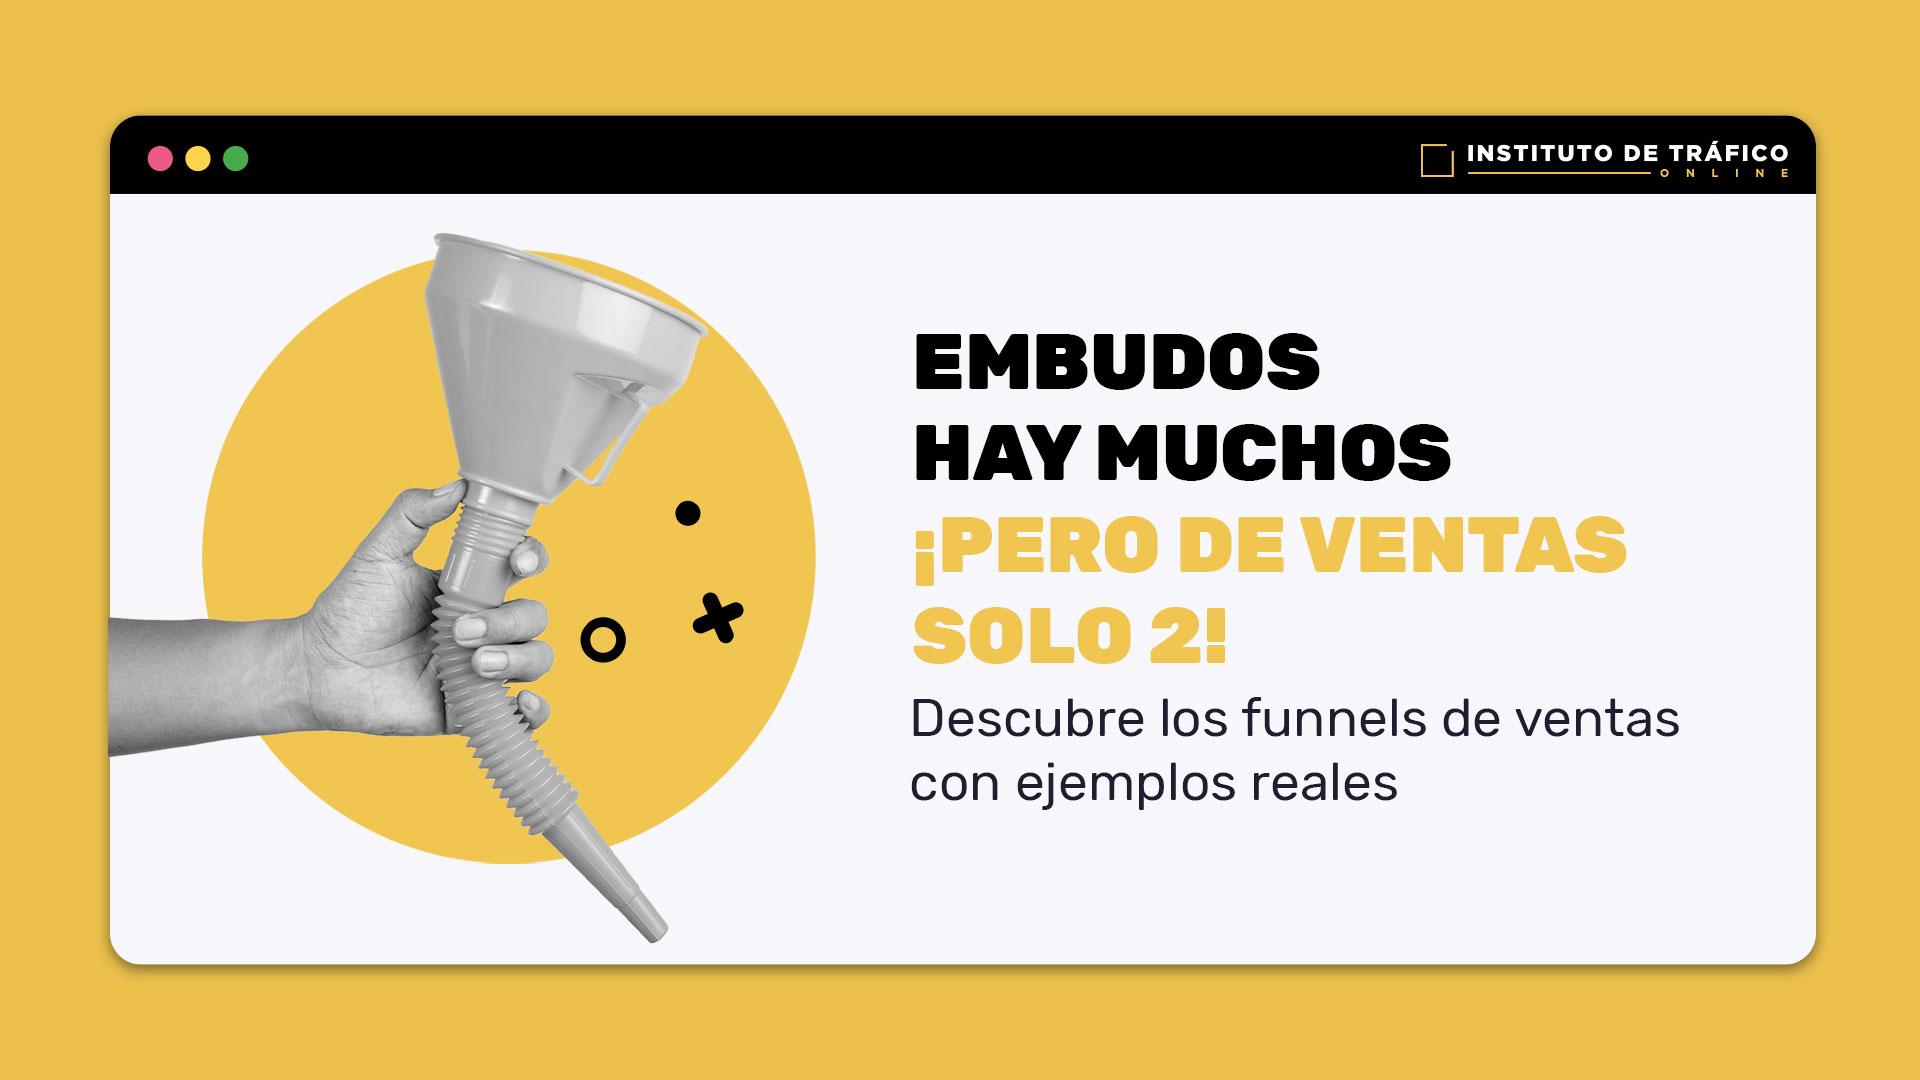 funnels-de-ventas-portada-instituto-trafico-online-ito-roberto-gamboa